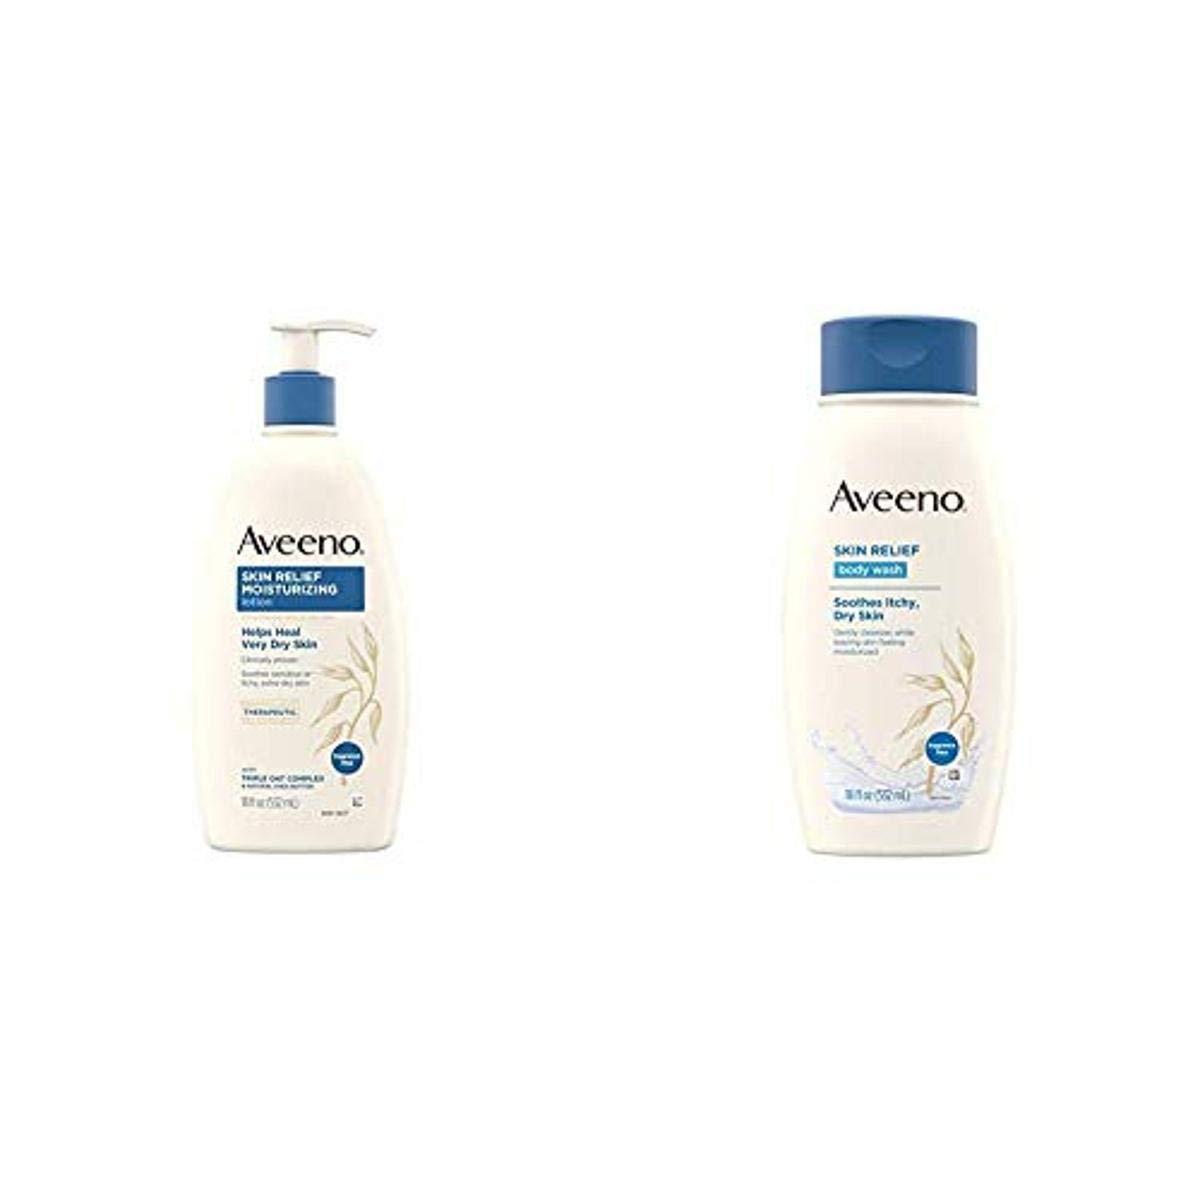 Aveeno Skin Relief Fragrance-Free Moisturizing Daily Body Wash, 18 oz & Skin Relief Fragrance-Free Moisturizing Body Lotion for Sensitive Skin, 18 oz